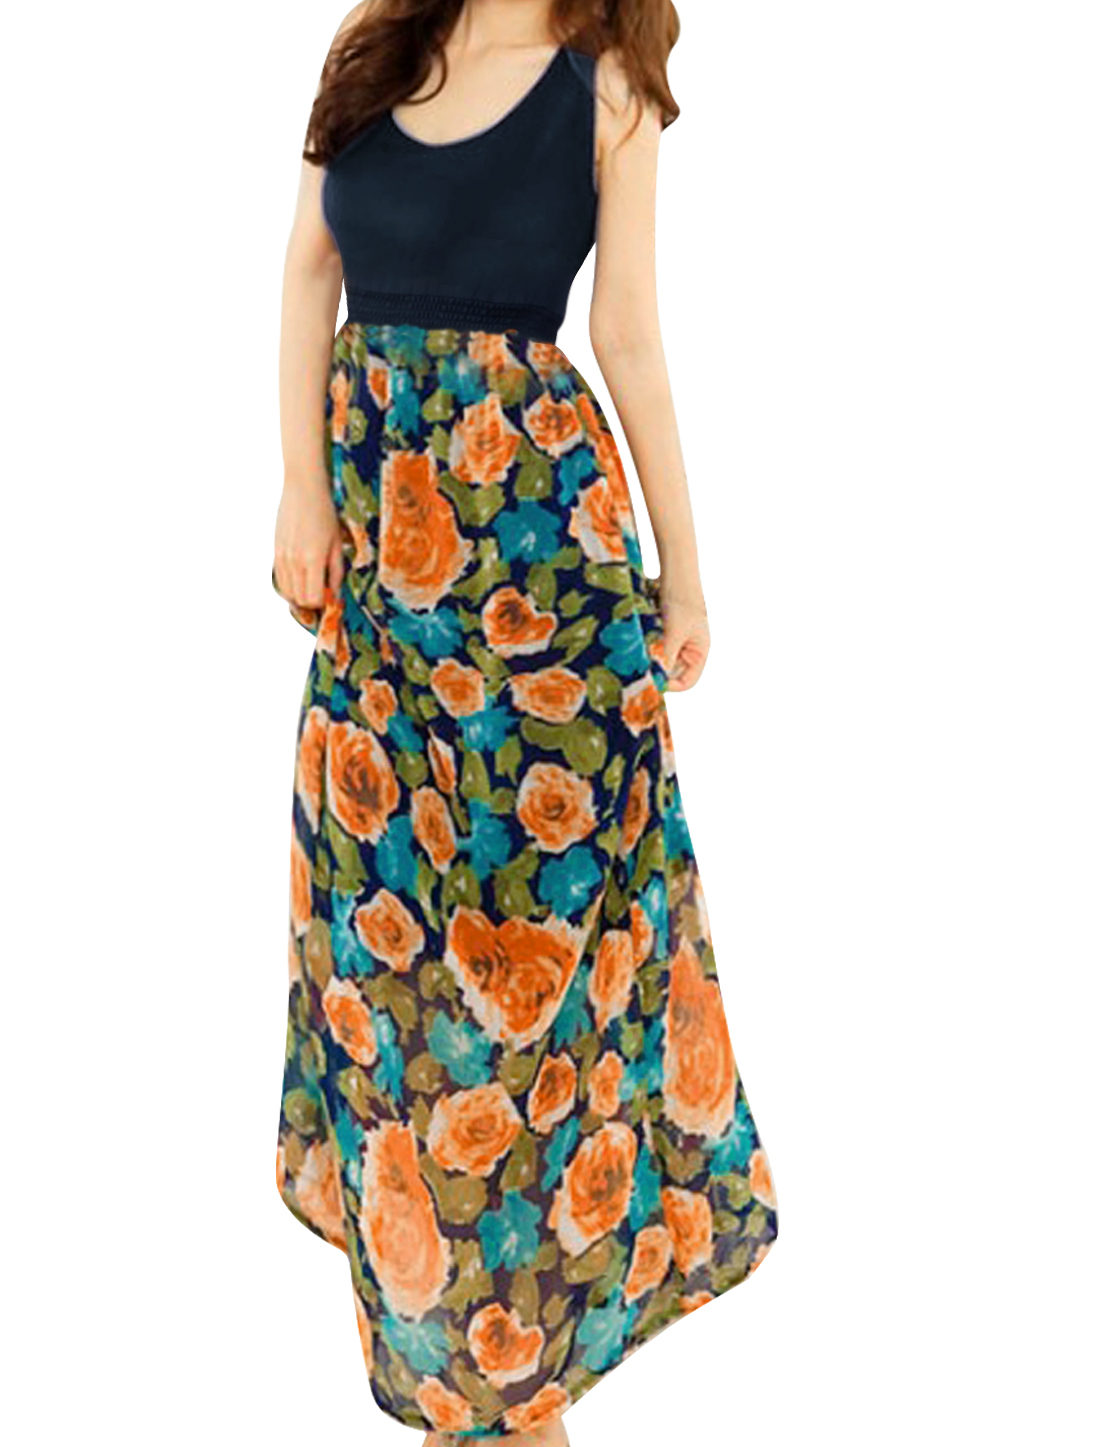 Lady Newly Sleeveless Floral Pattern Dark Blue Splice Maxi Dress L